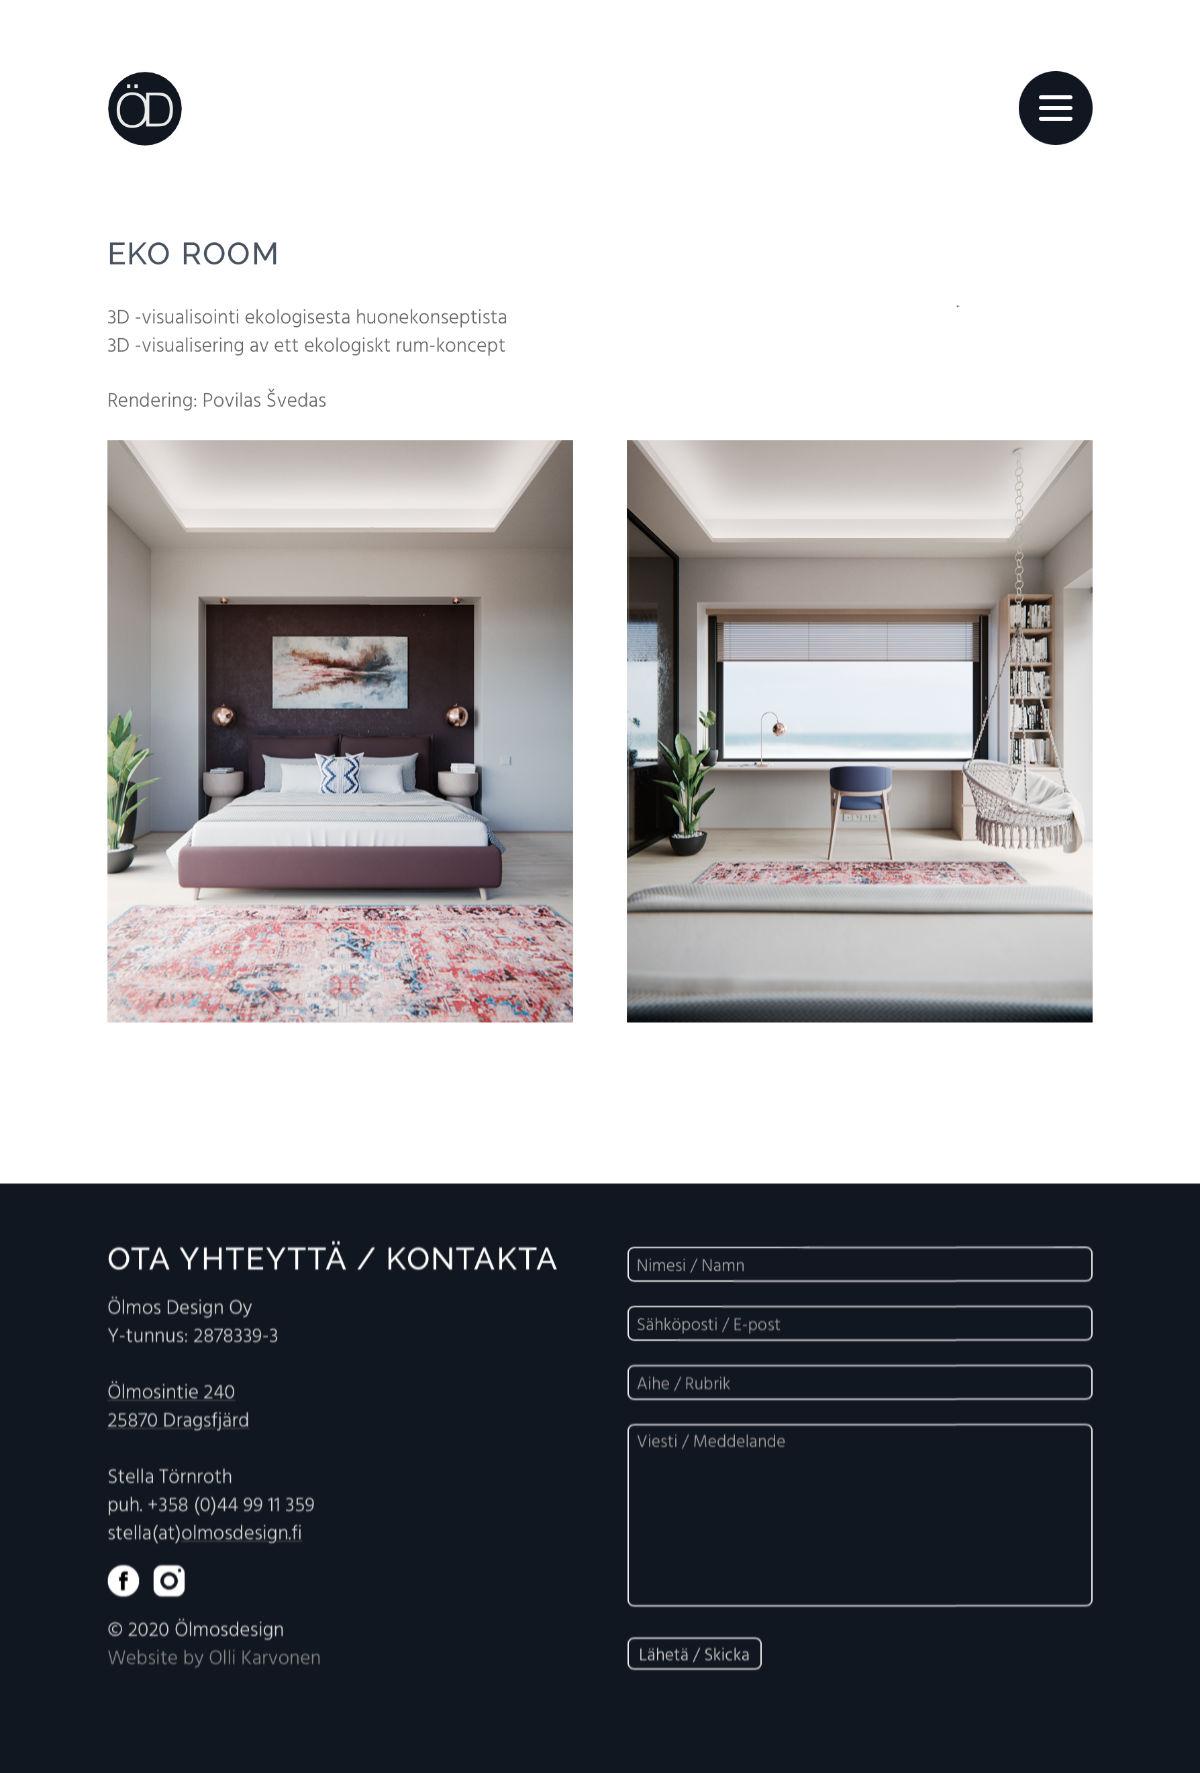 Website/portfolio for Stella Törnroth. Website based on her design. Made by Olli Karvonen.